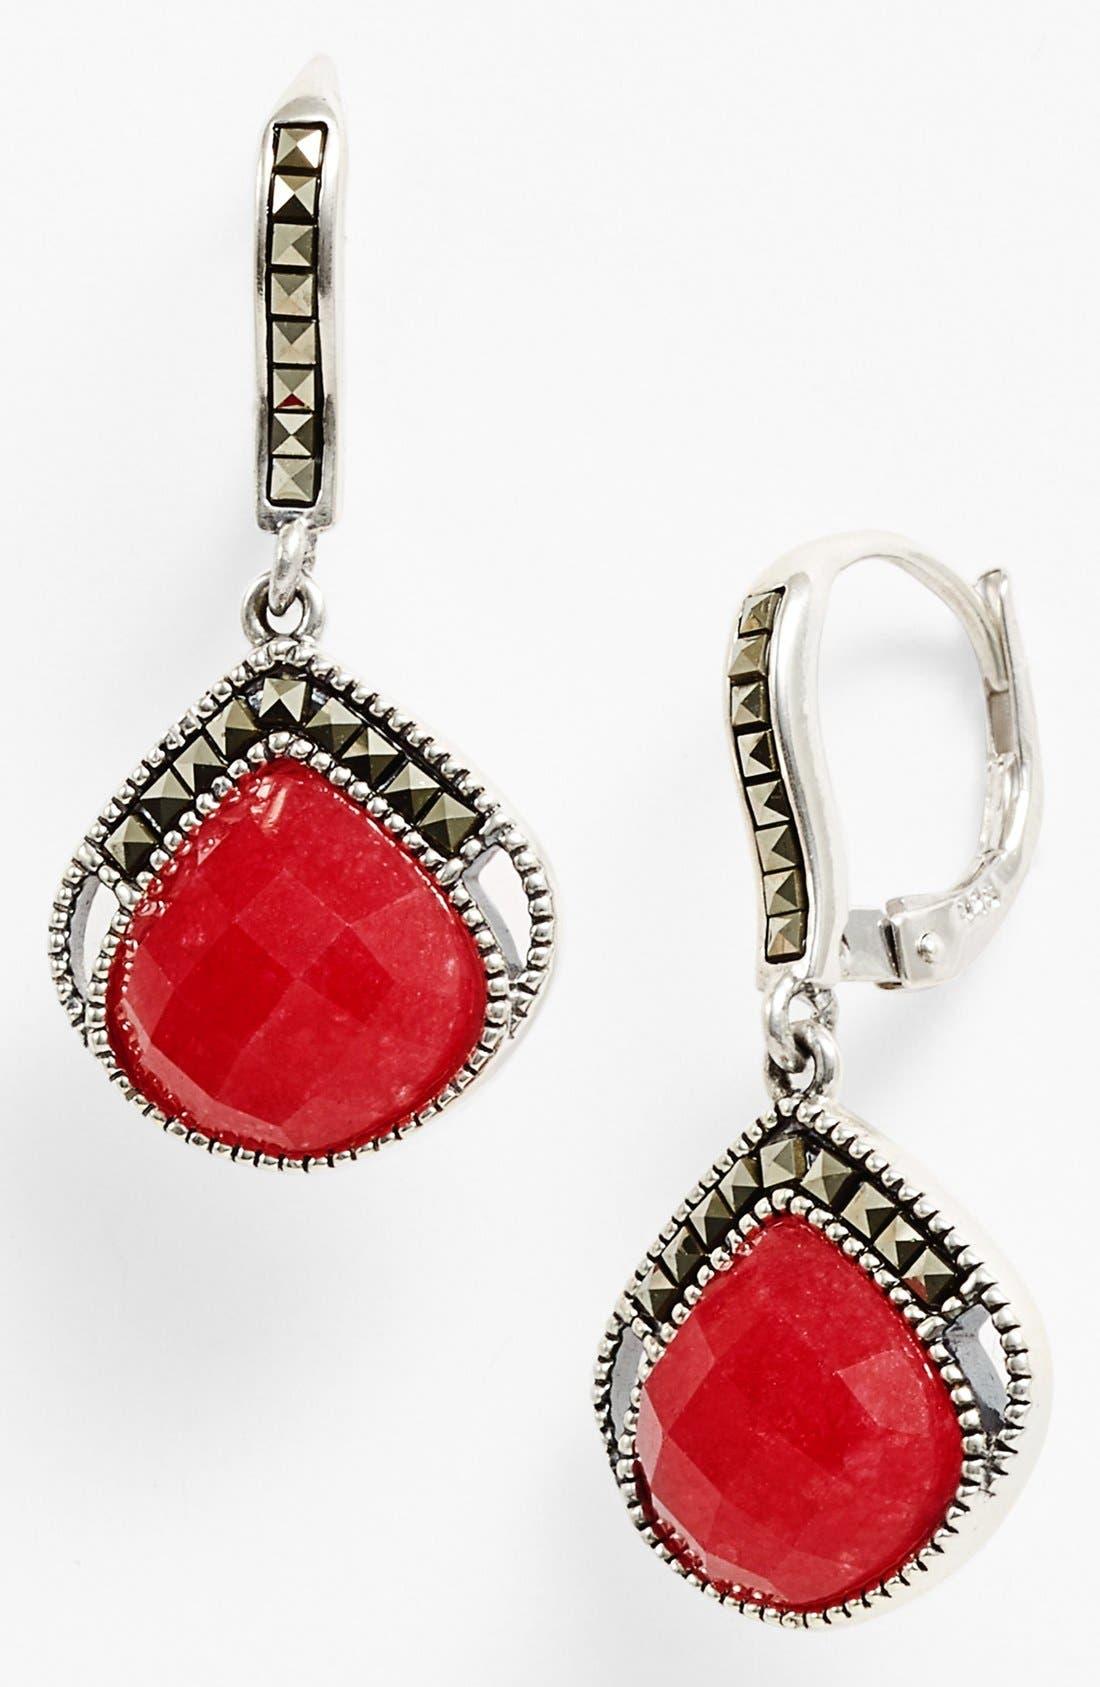 Alternate Image 1 Selected - Judith Jack 'Flamenco' Drop Earrings